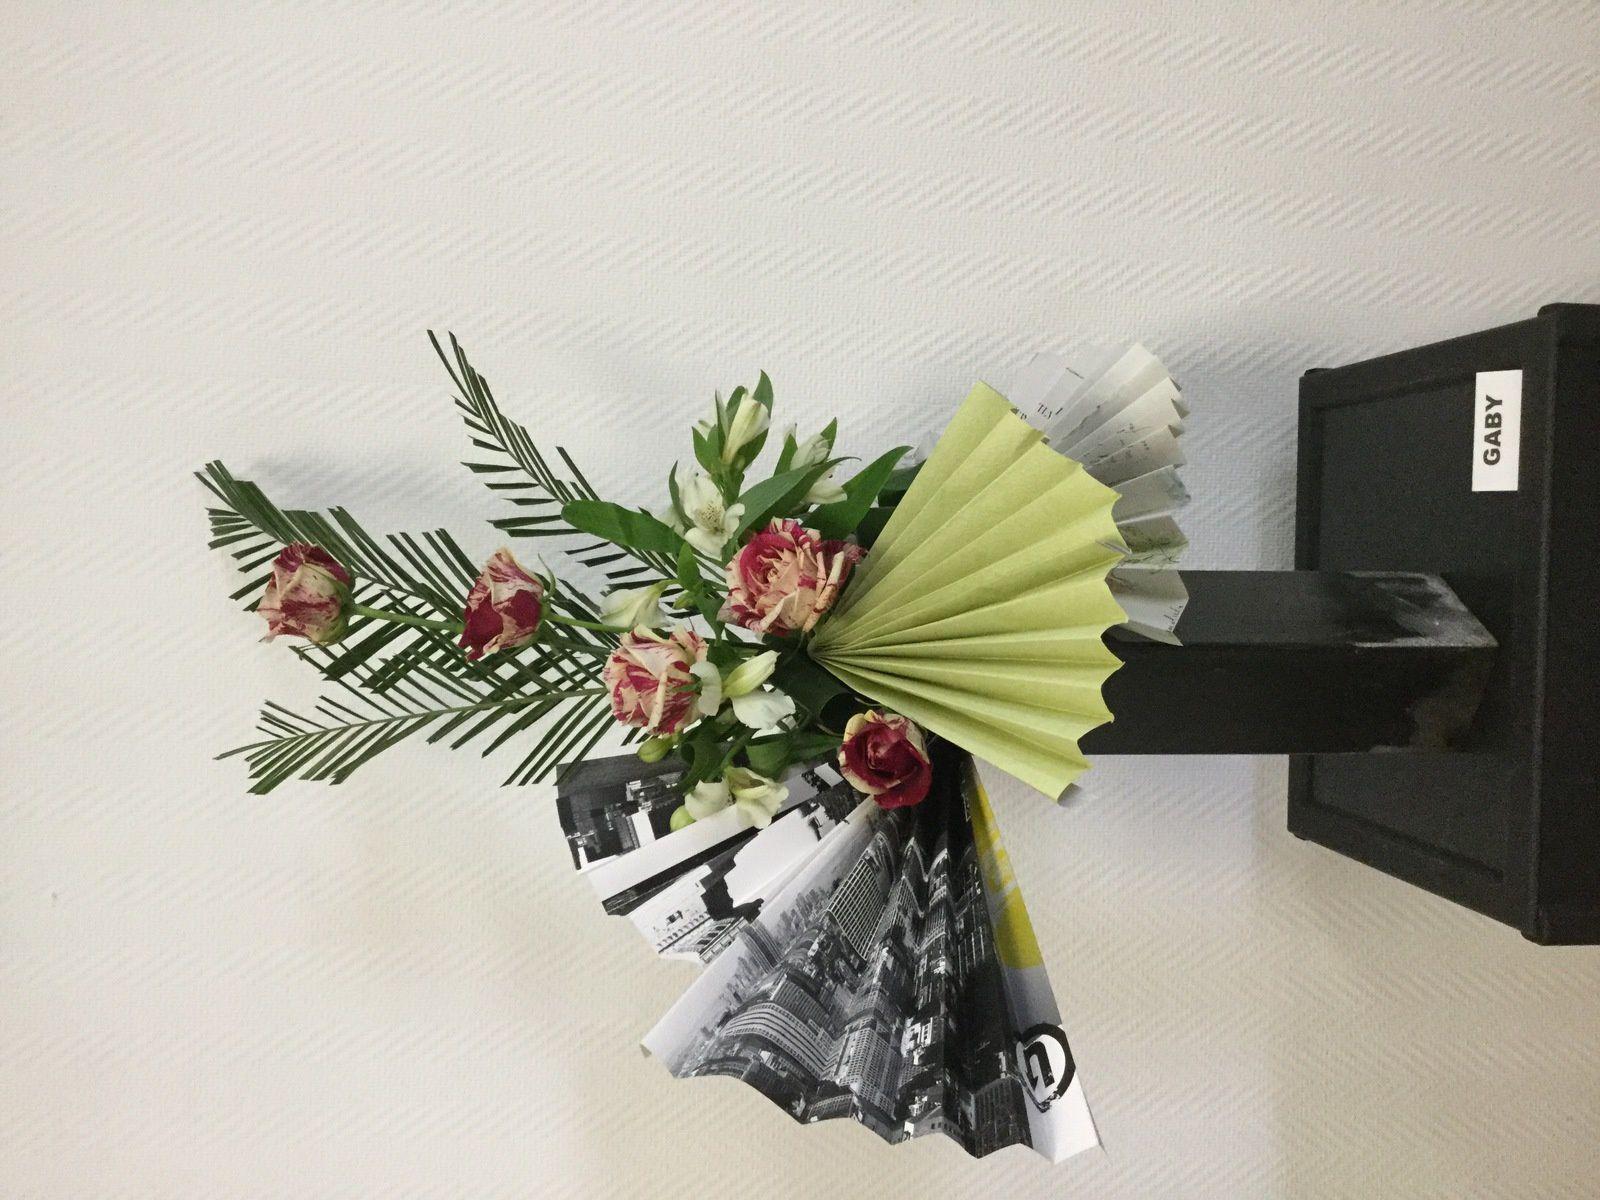 Roses, Robelini, Aspidistra, Alstromeria,